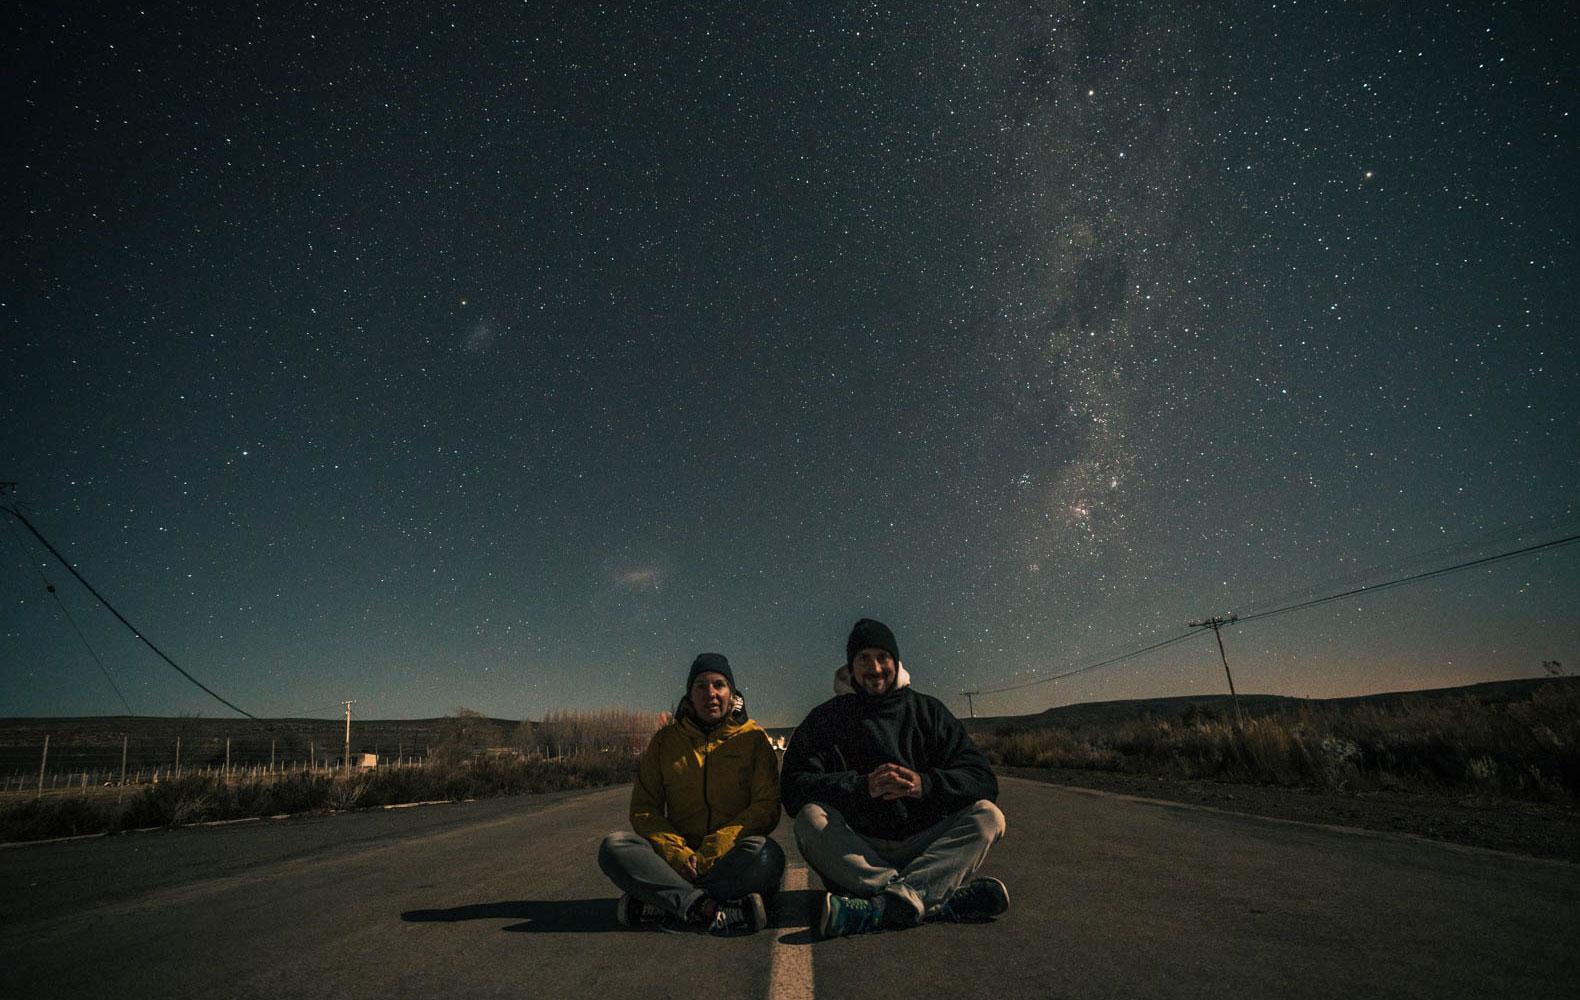 Sutherland, Südafrika - Stargazing